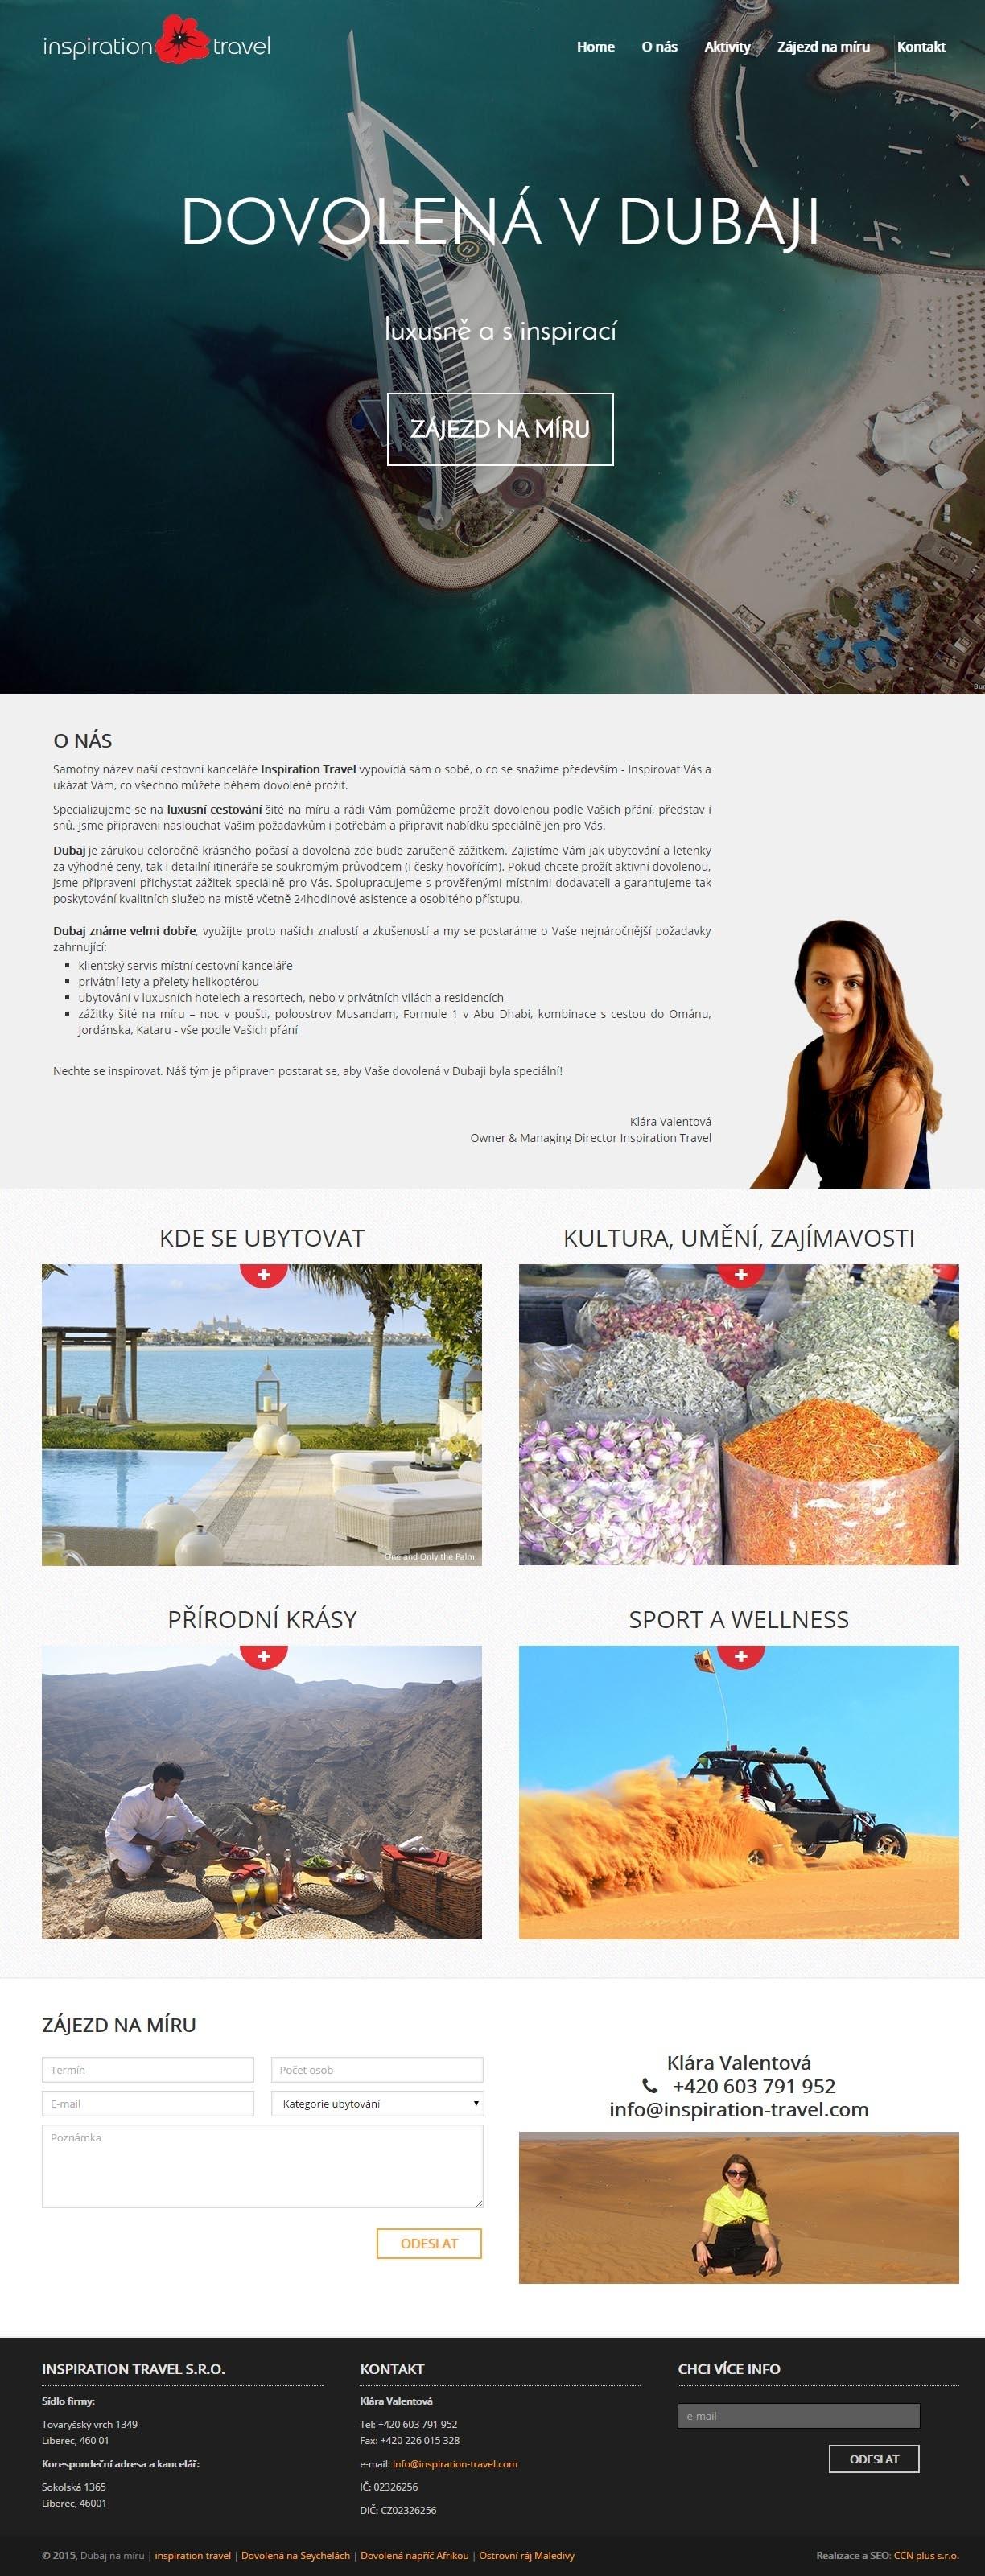 Dubaj na míru - Inspiration Travel